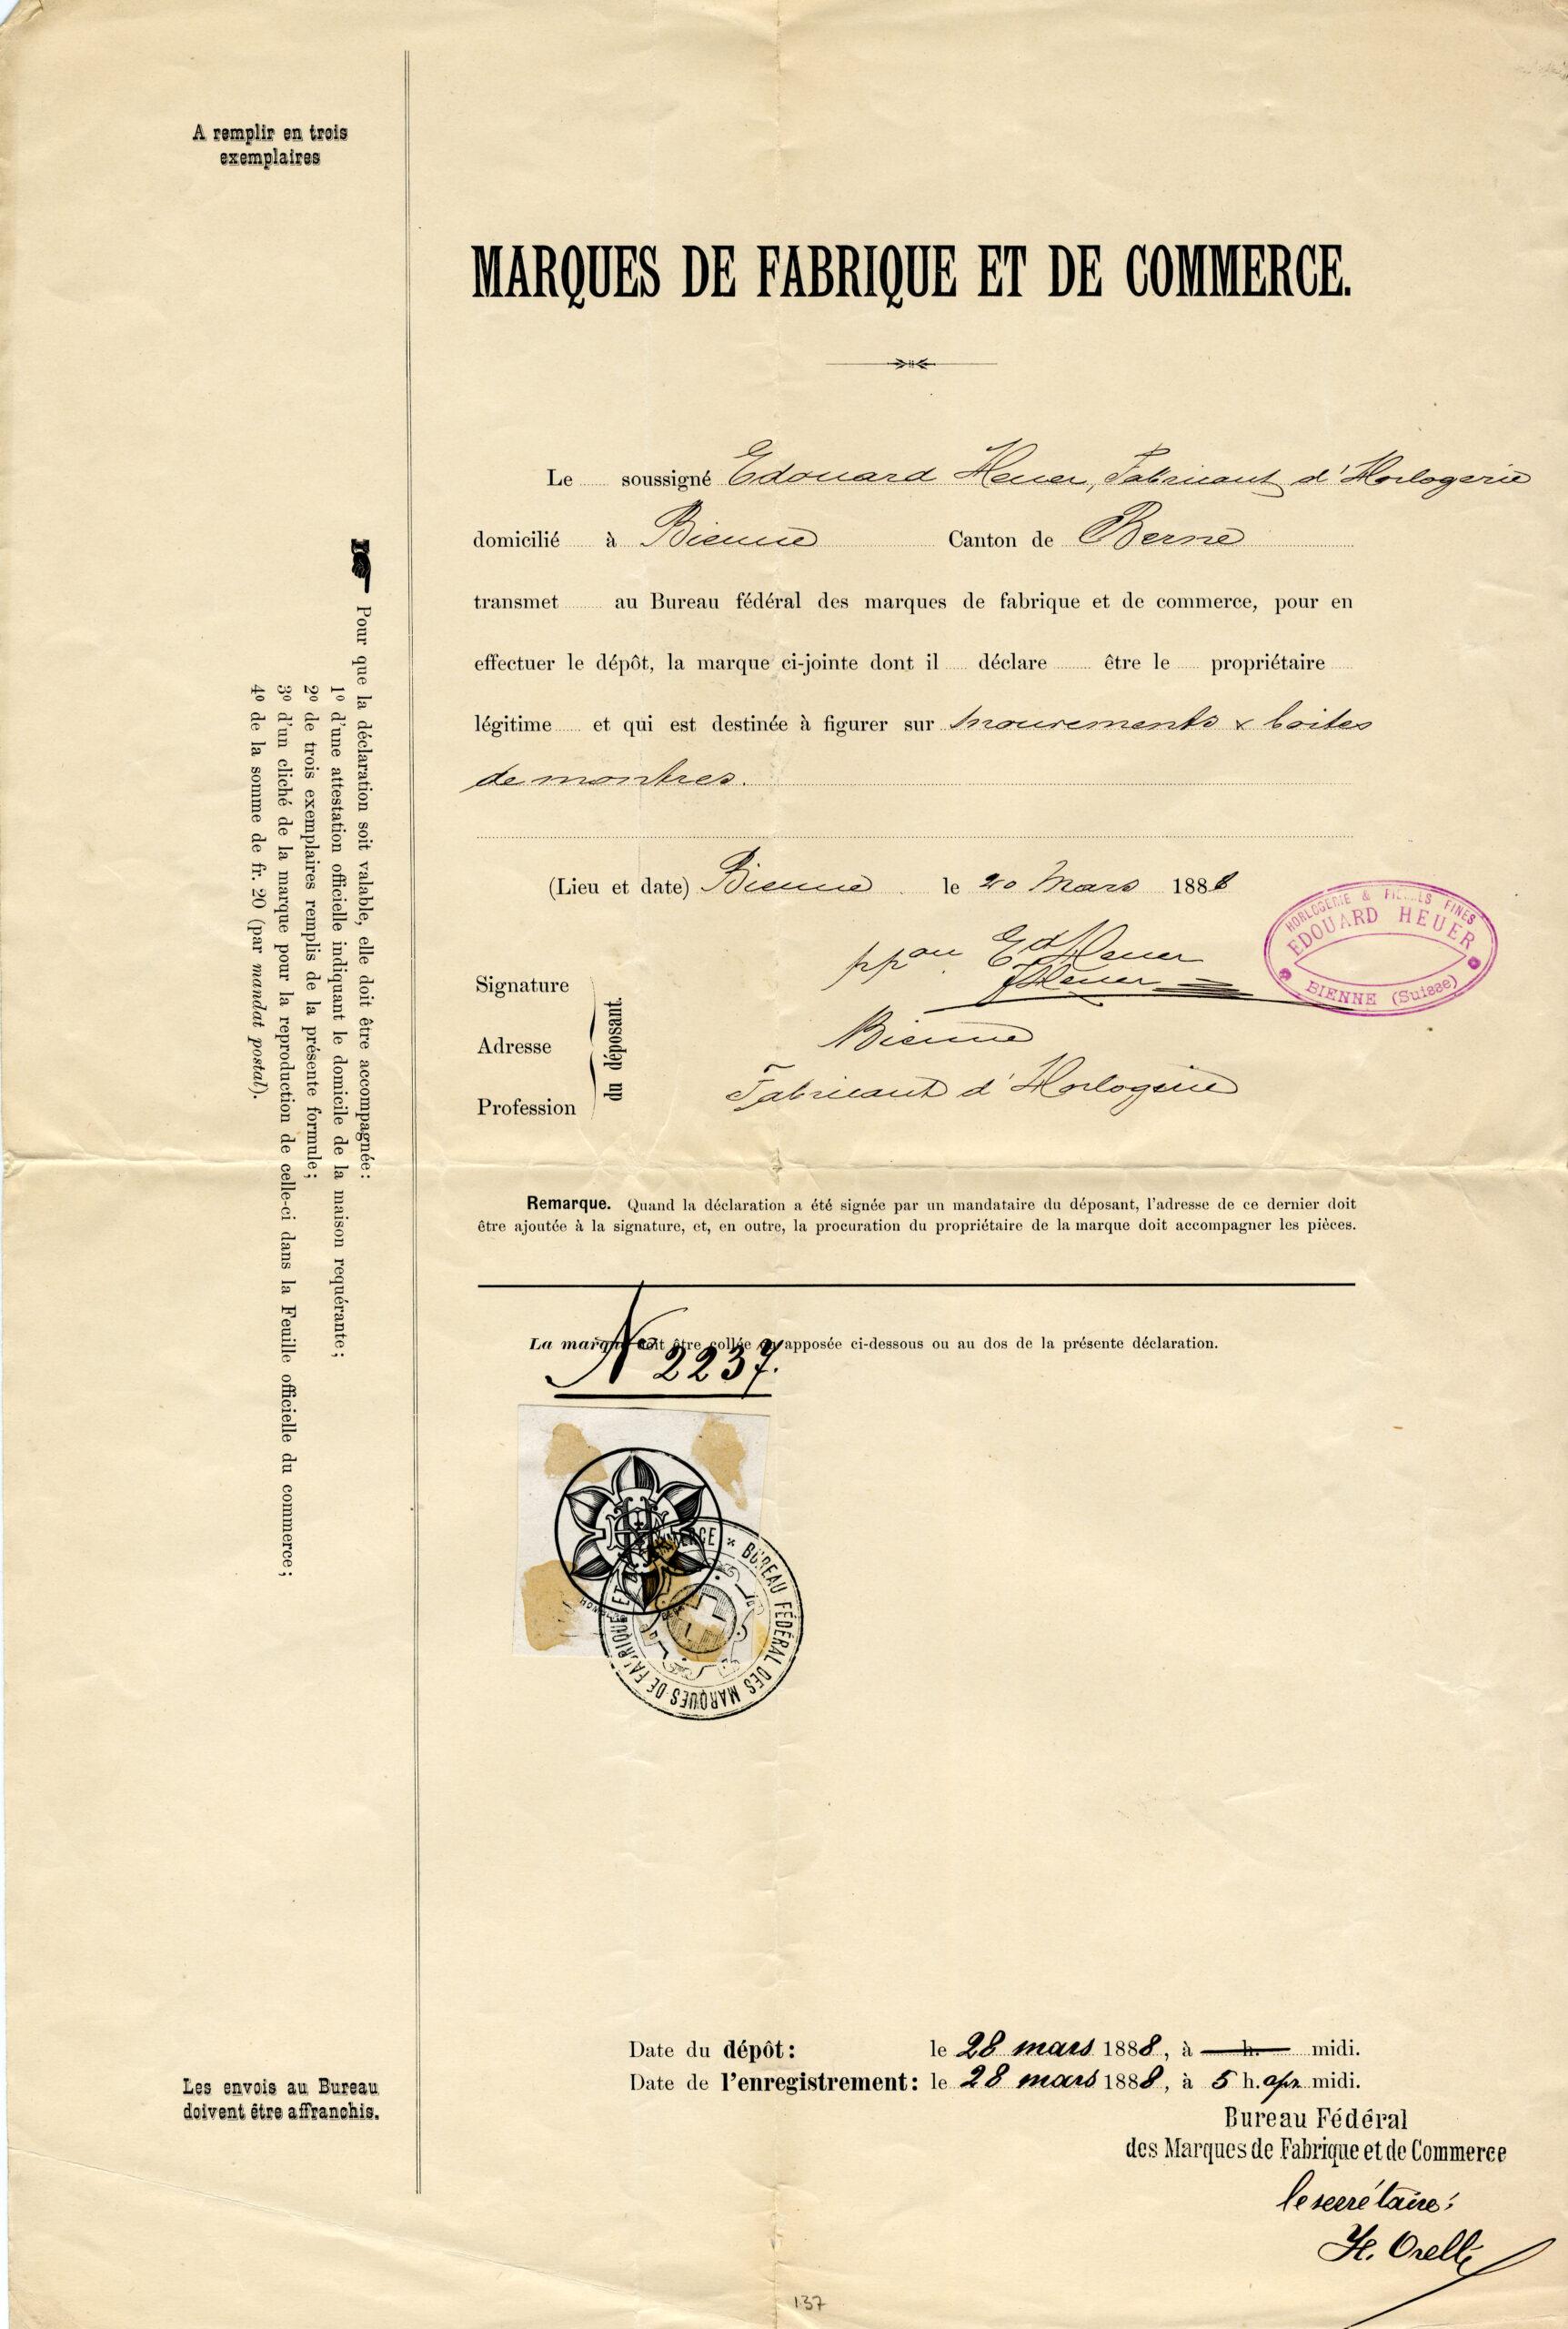 The Charles-Edouard Heuer blossom trademark